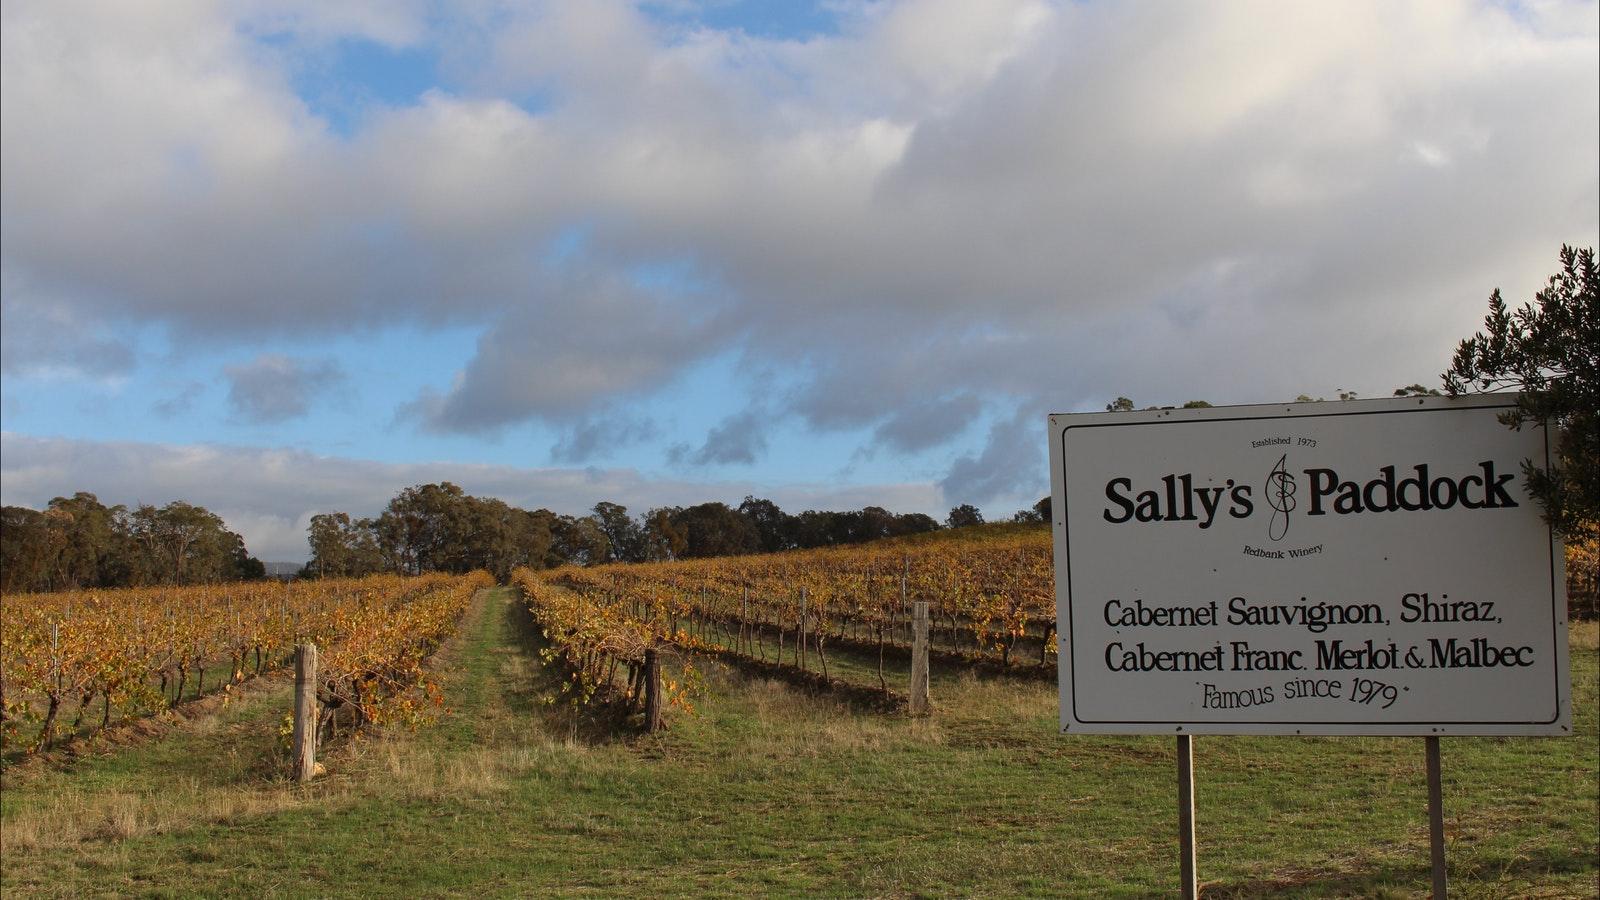 The Sally's Paddock vineyard